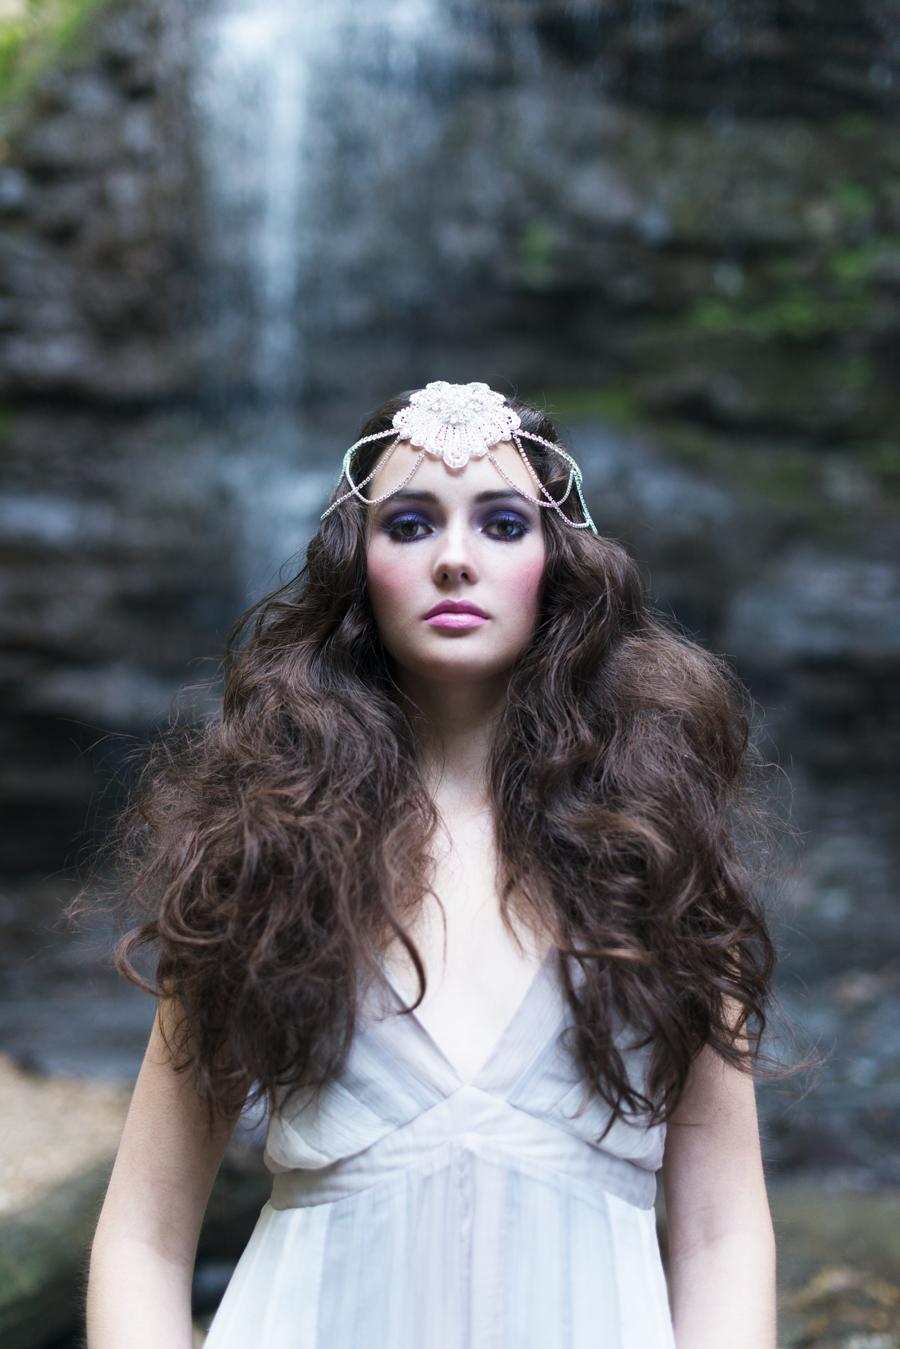 Whitney-Heard-Photography-Blair-Styled-Shoot-Web-8.jpg